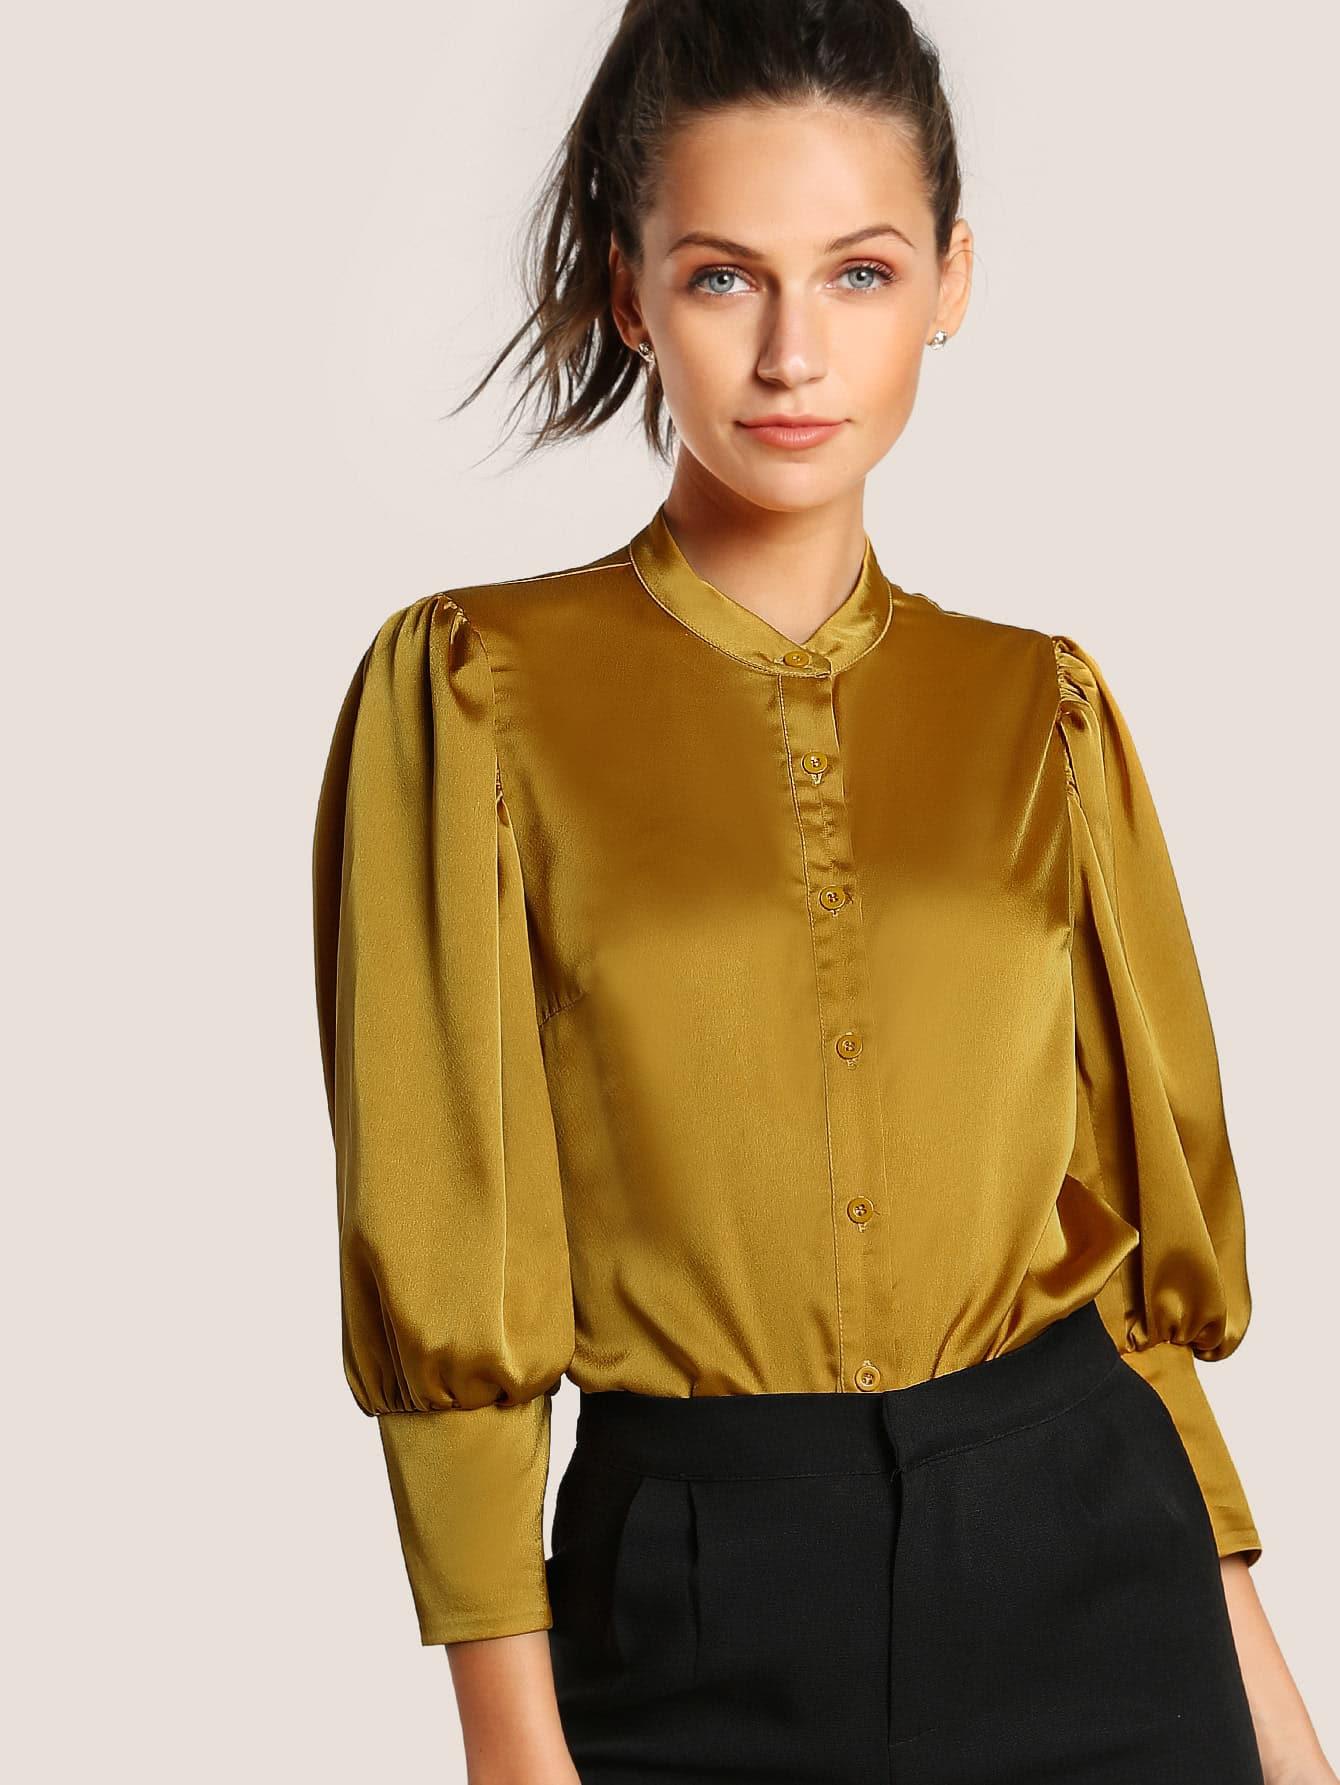 Puff Sleeve Button Through Satin Top Emmacloth Women Fast